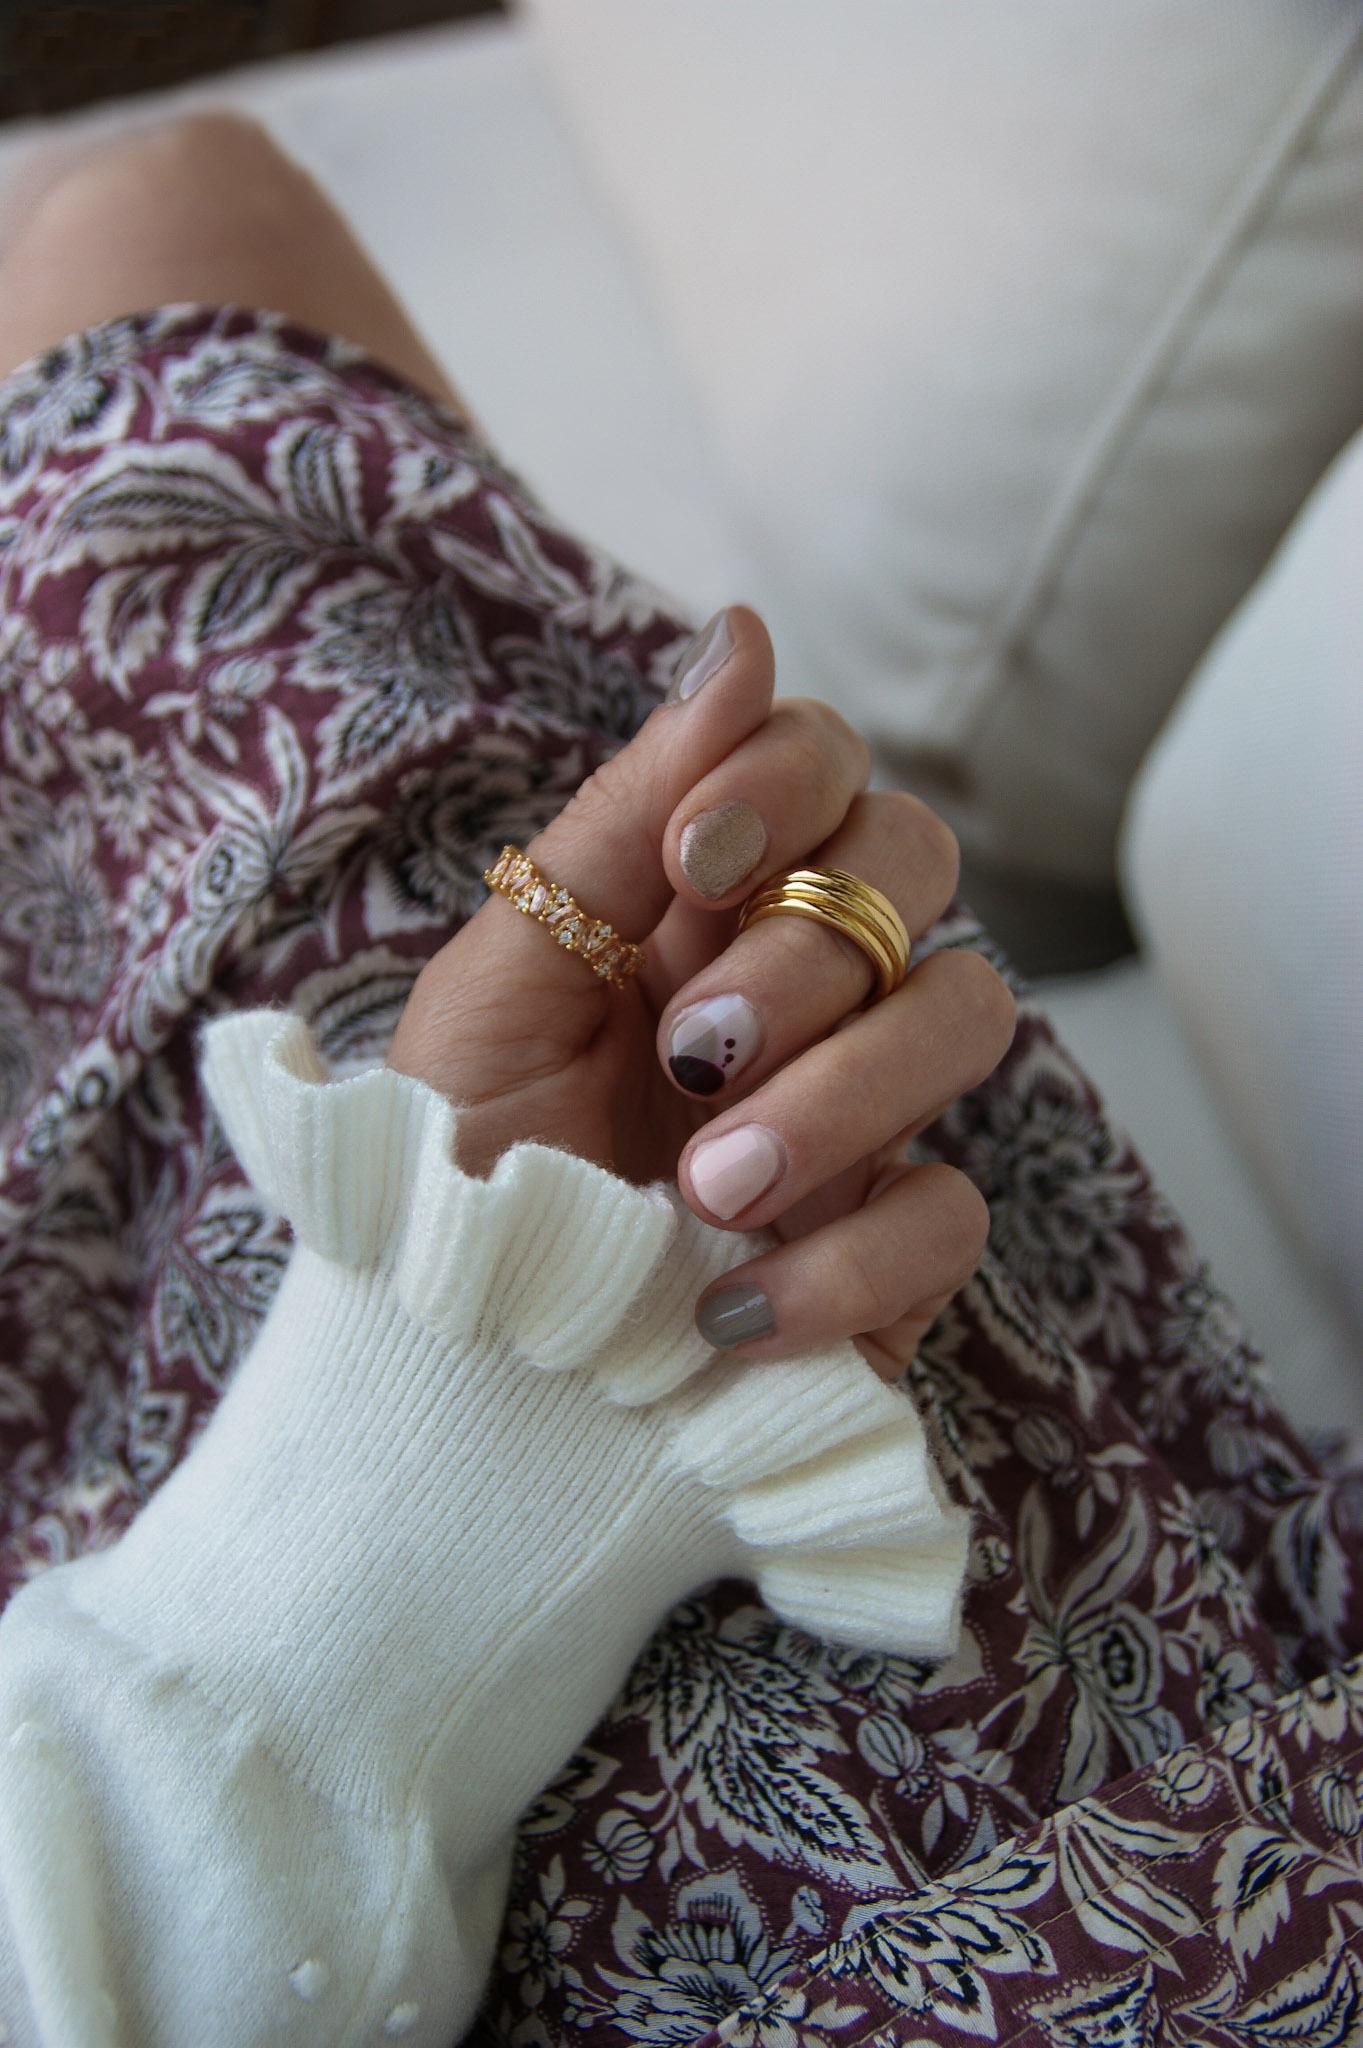 Alessandro striplac crush on chrome nails